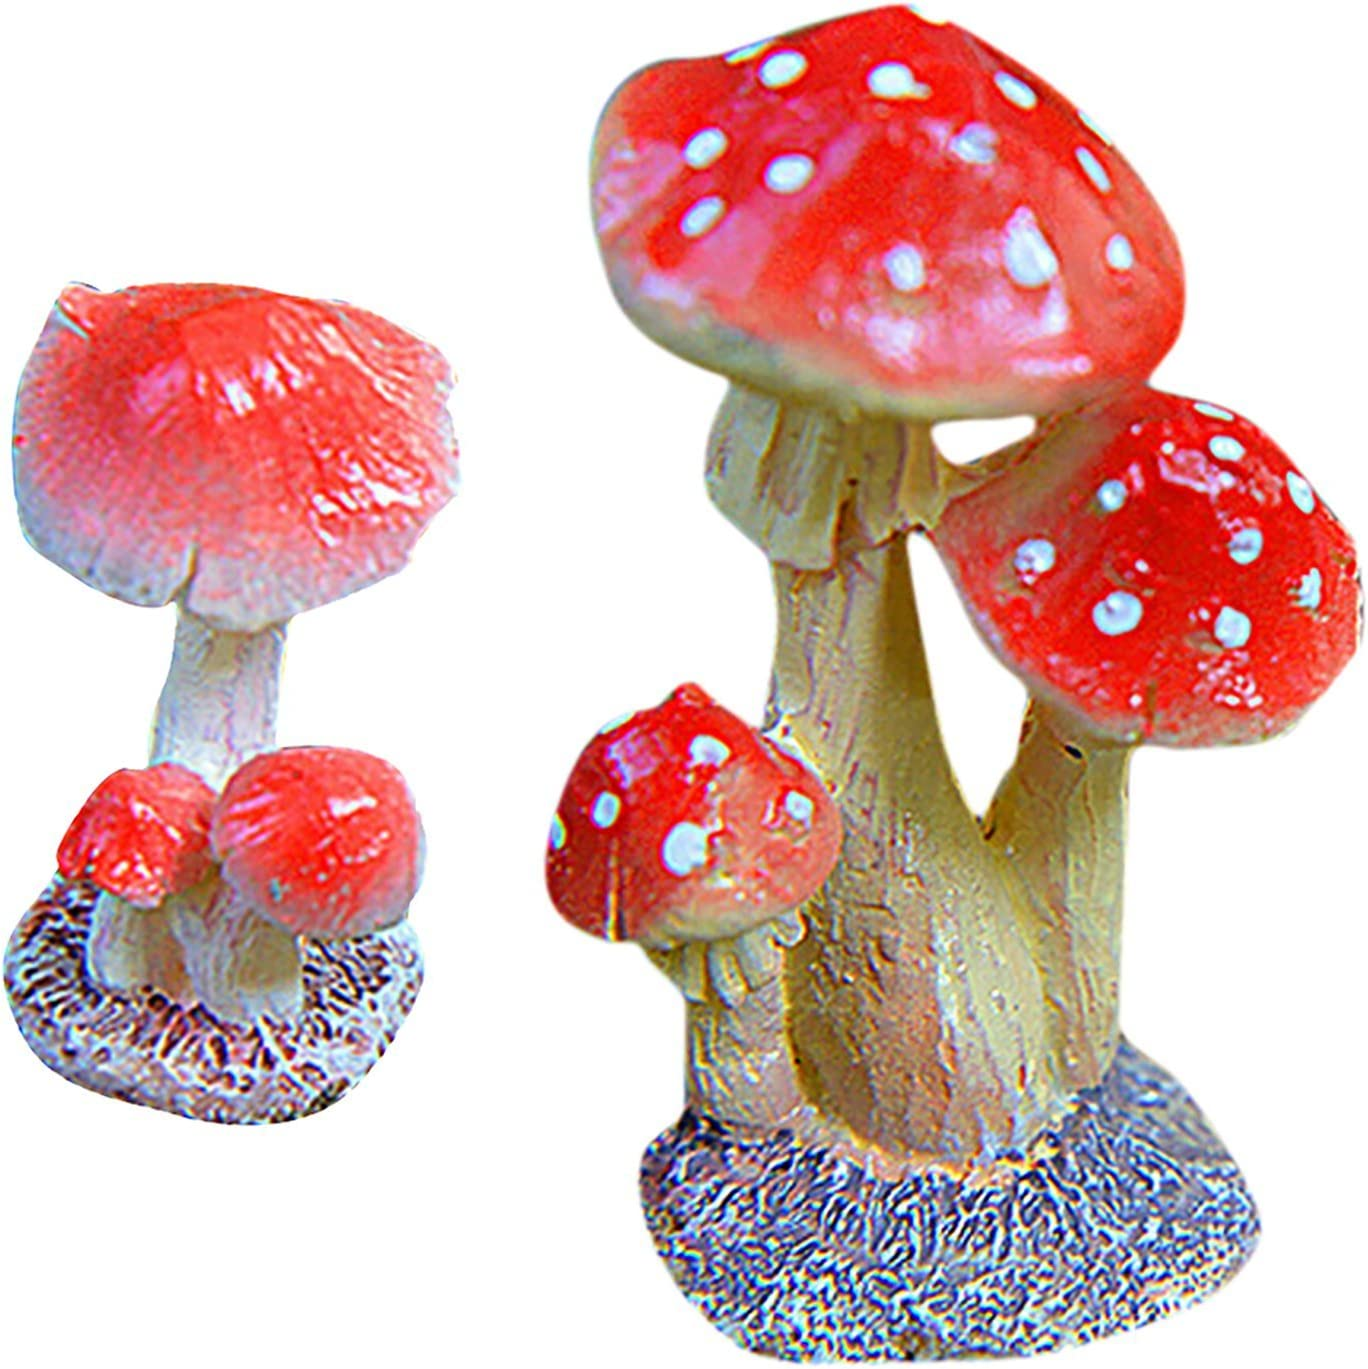 3 Size Mushroom Miniature Garden Ornament DIY Craft Pot Fairy Dollhouse DecorFJJ